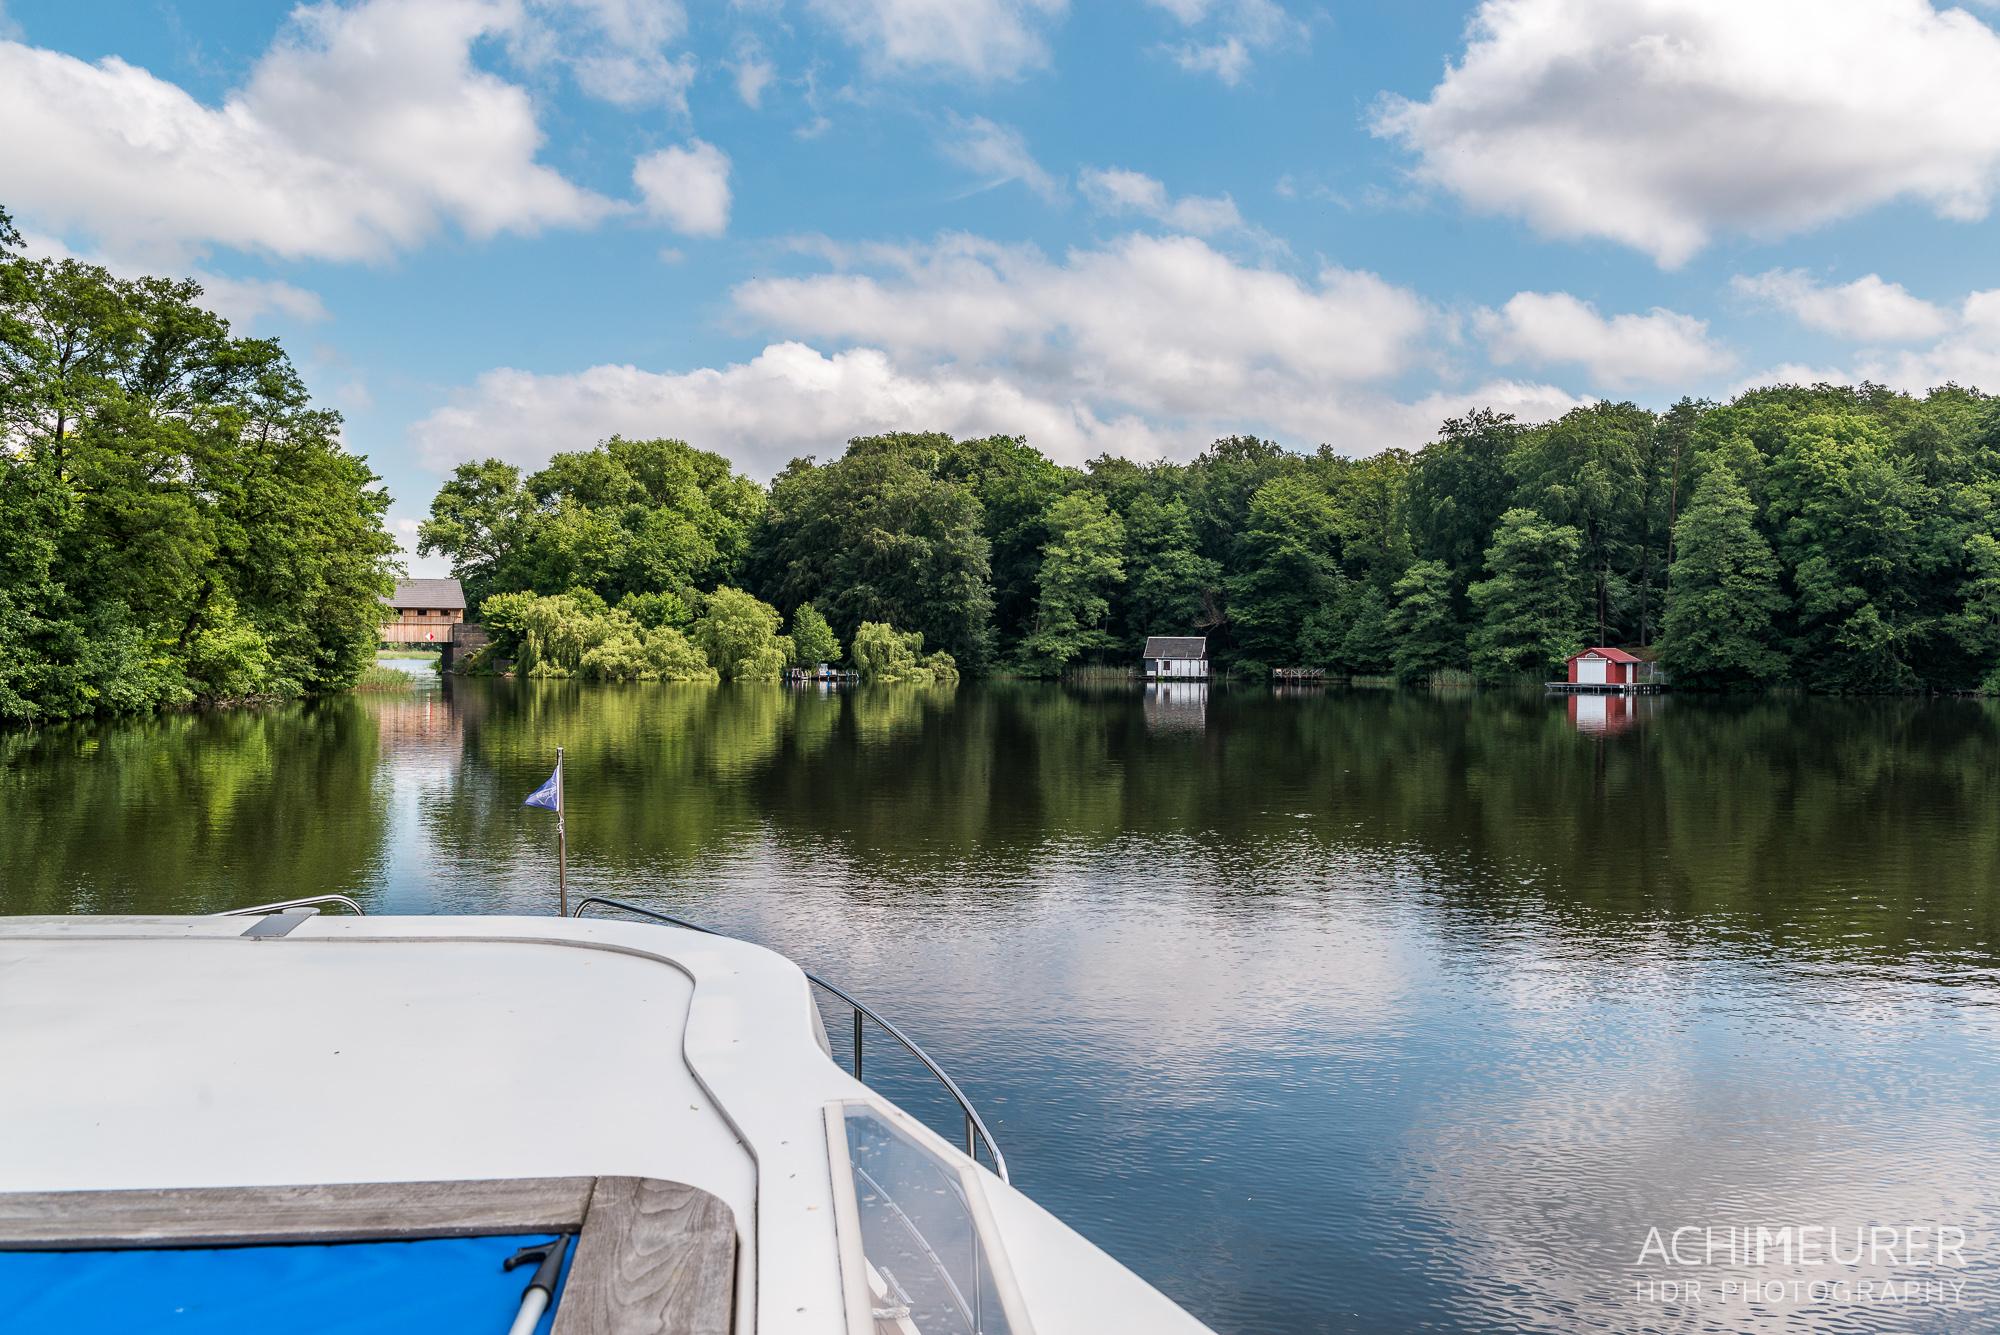 Hausboot-Kuhnle-Mueritz-Mecklenburg-Vorpommern-See_2879